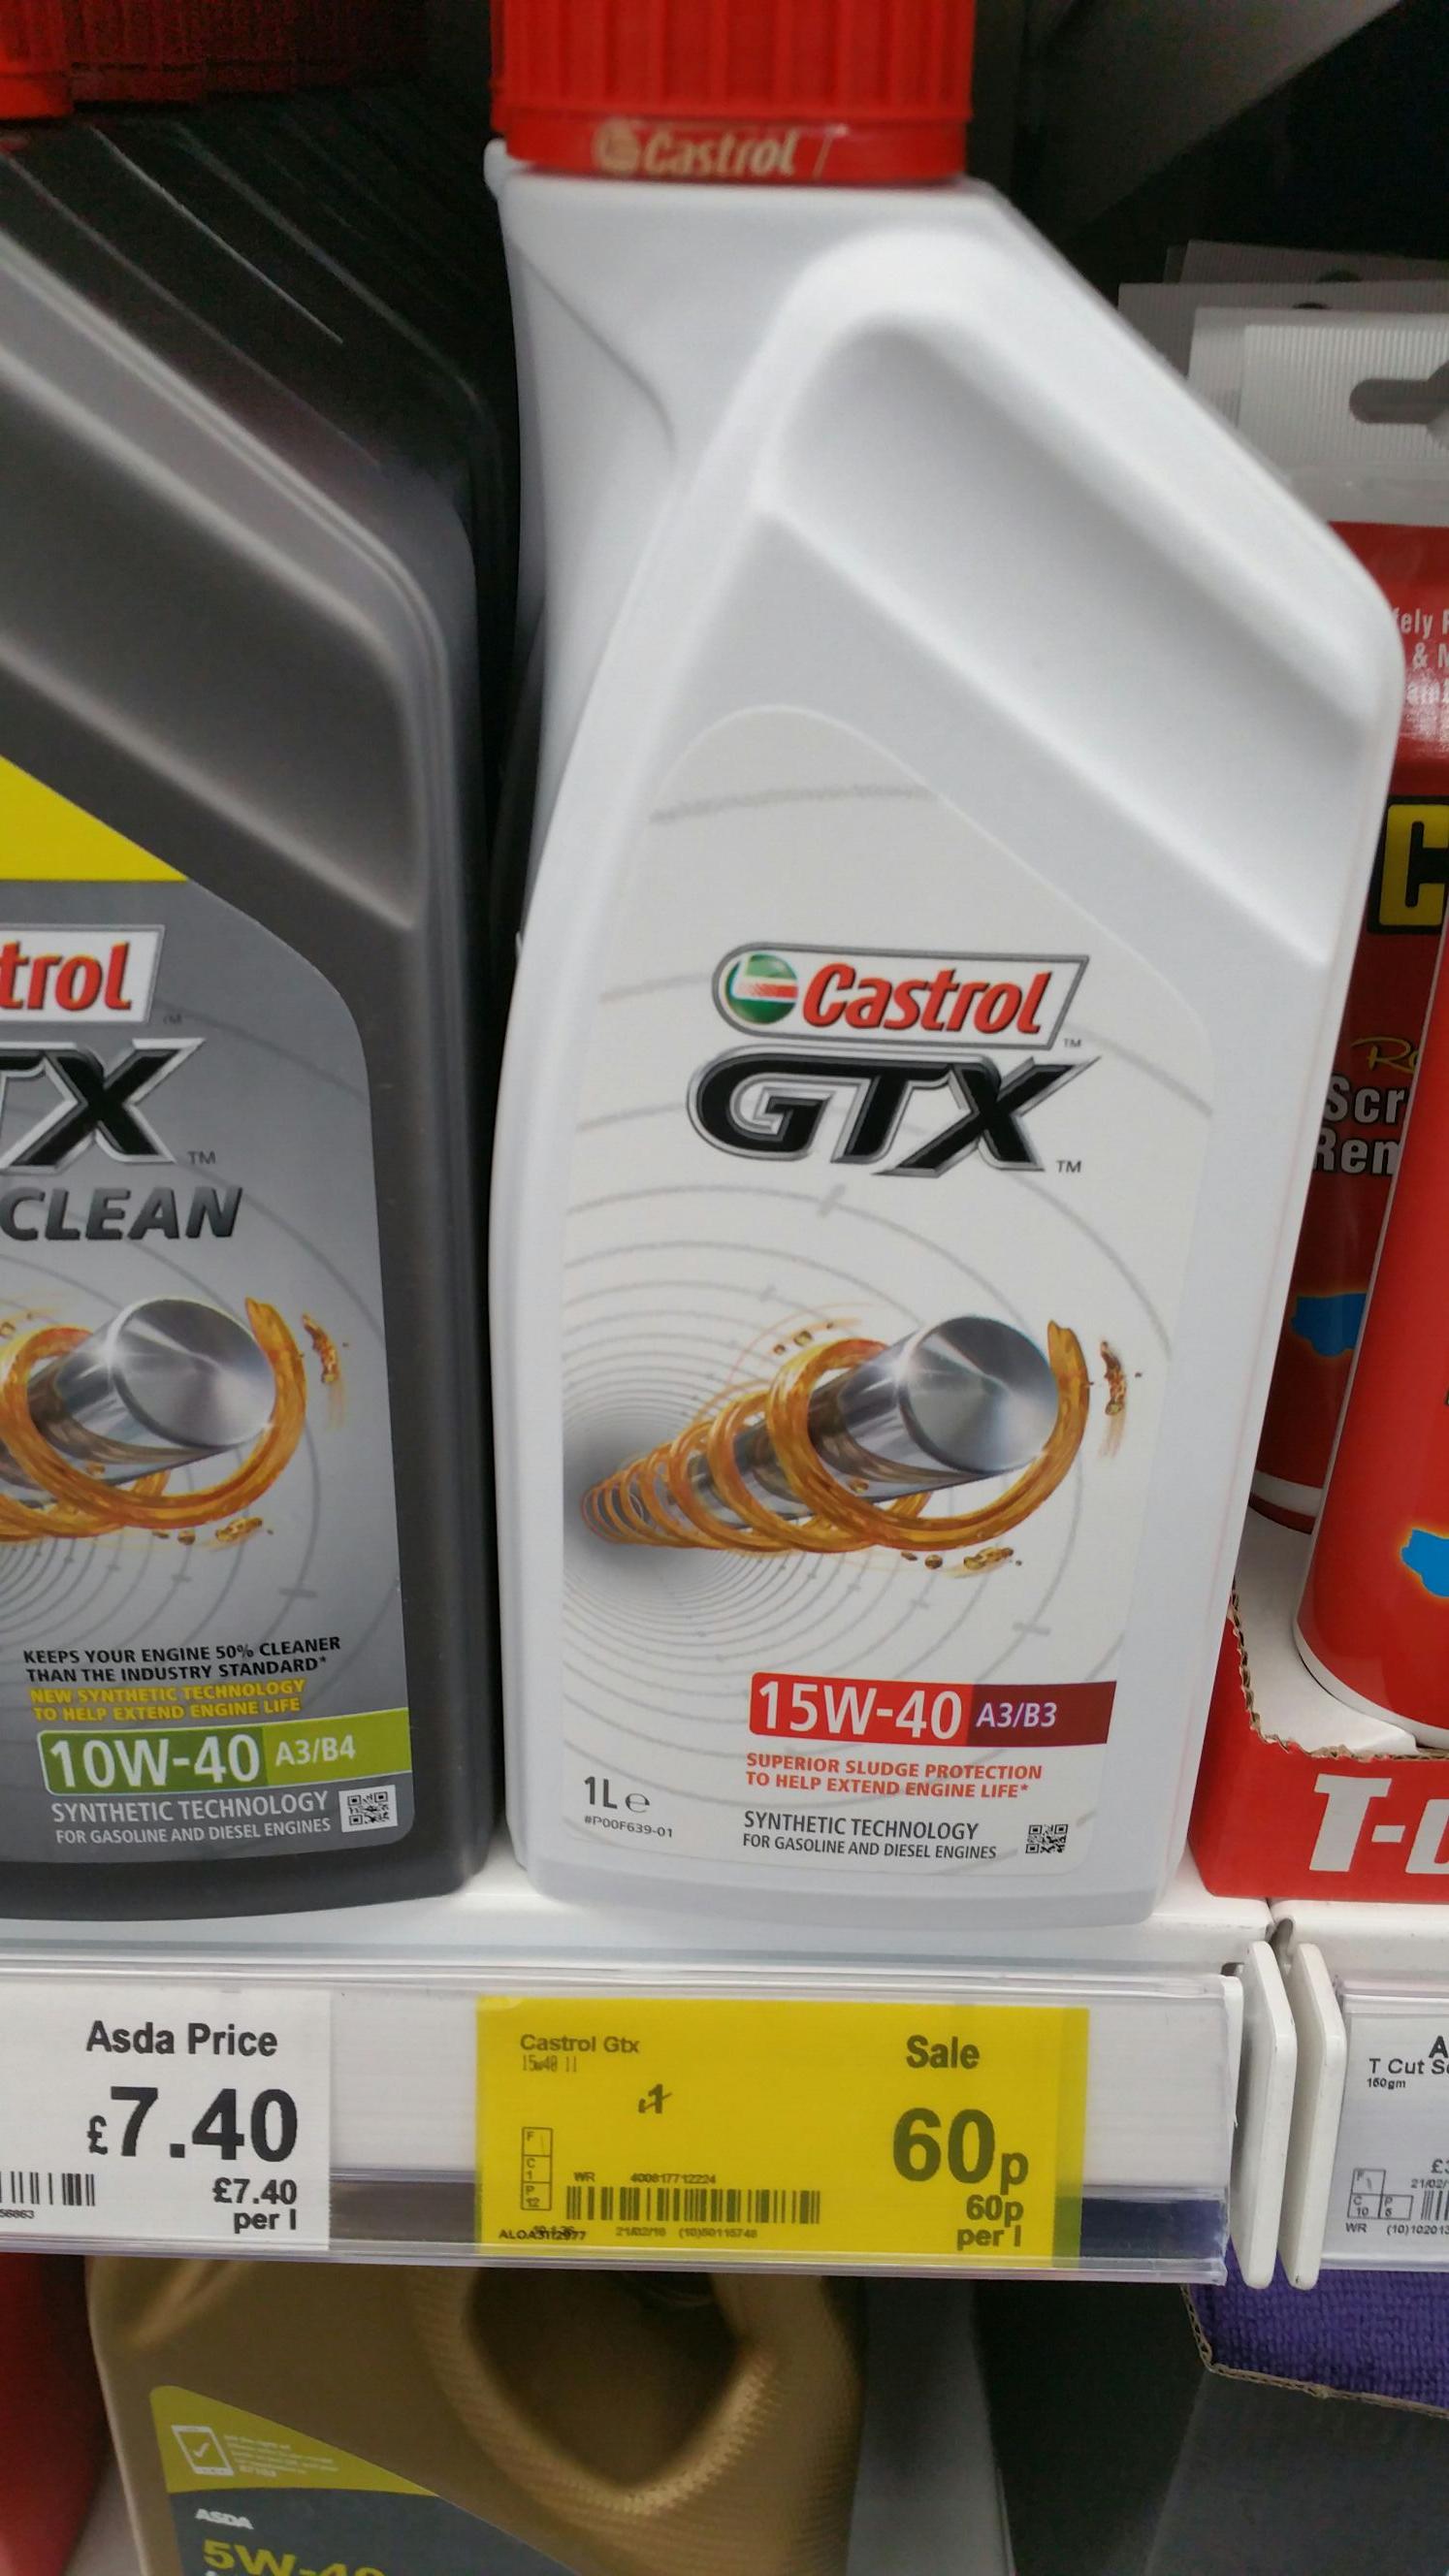 Castrol Gtx 15w-40 engine oil @ asda Reddish - 60p